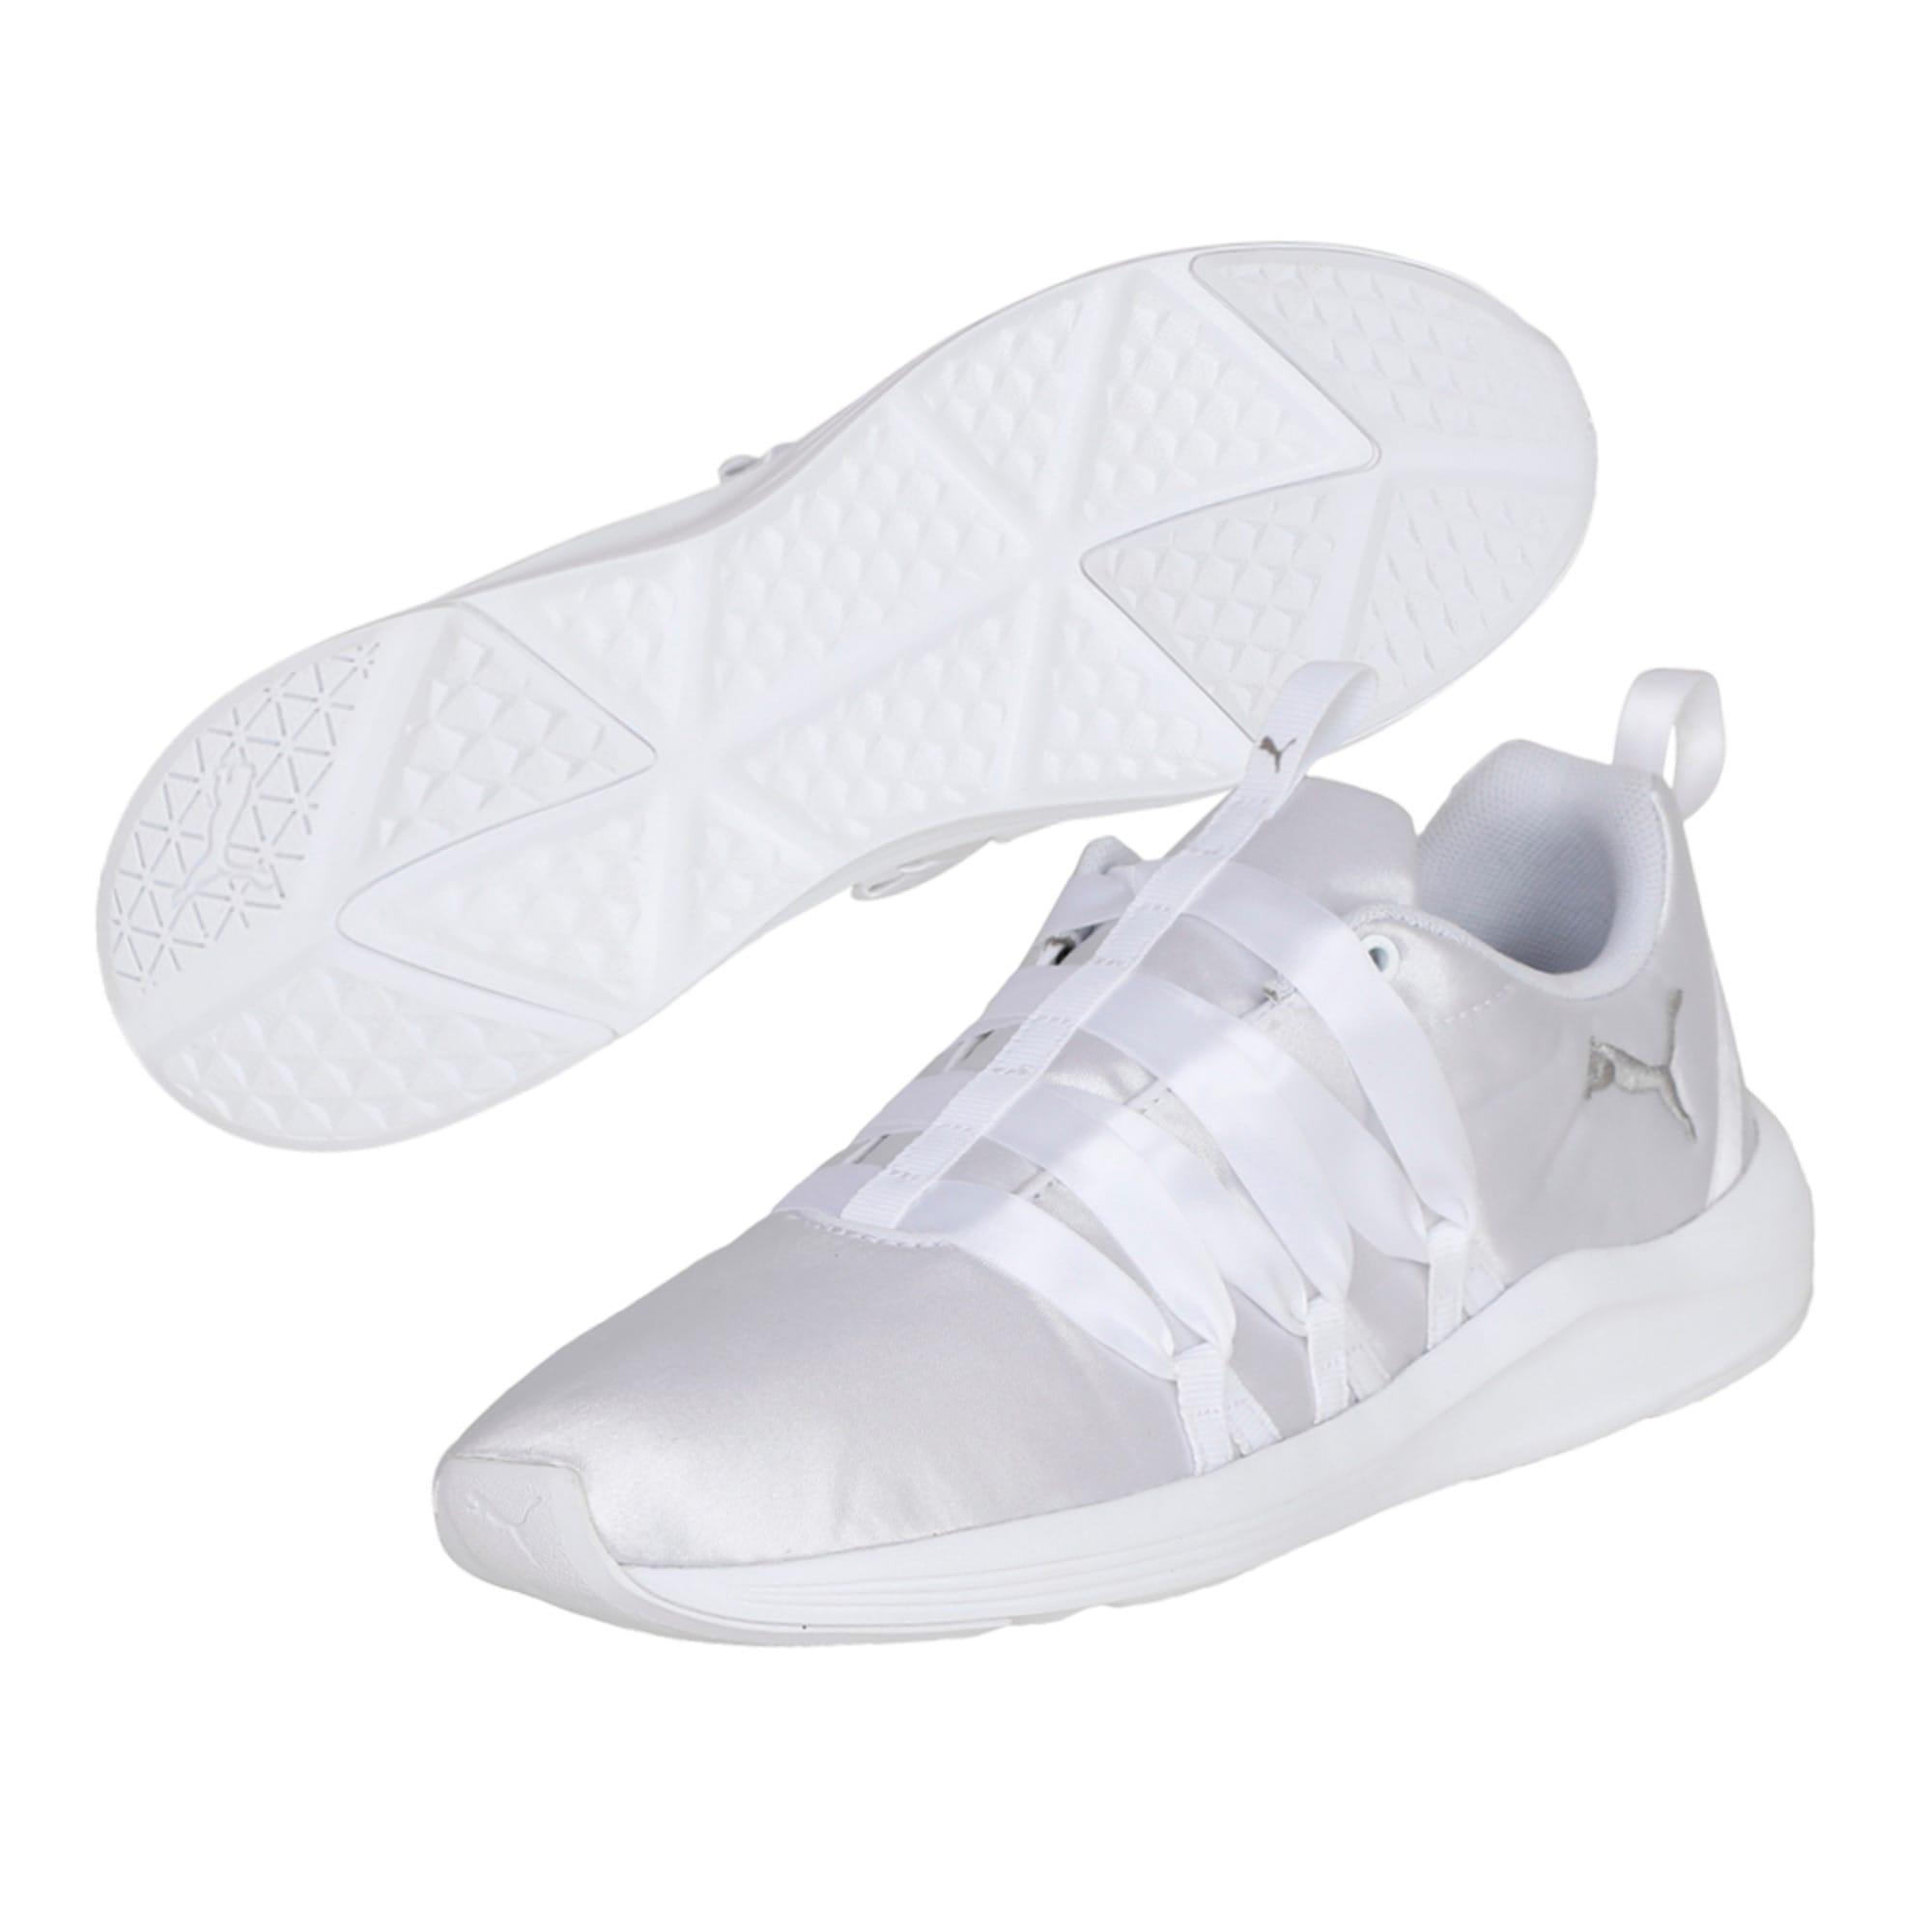 Thumbnail 6 of Prowl Alt Satin Women's Training Shoes, Puma White, medium-IND